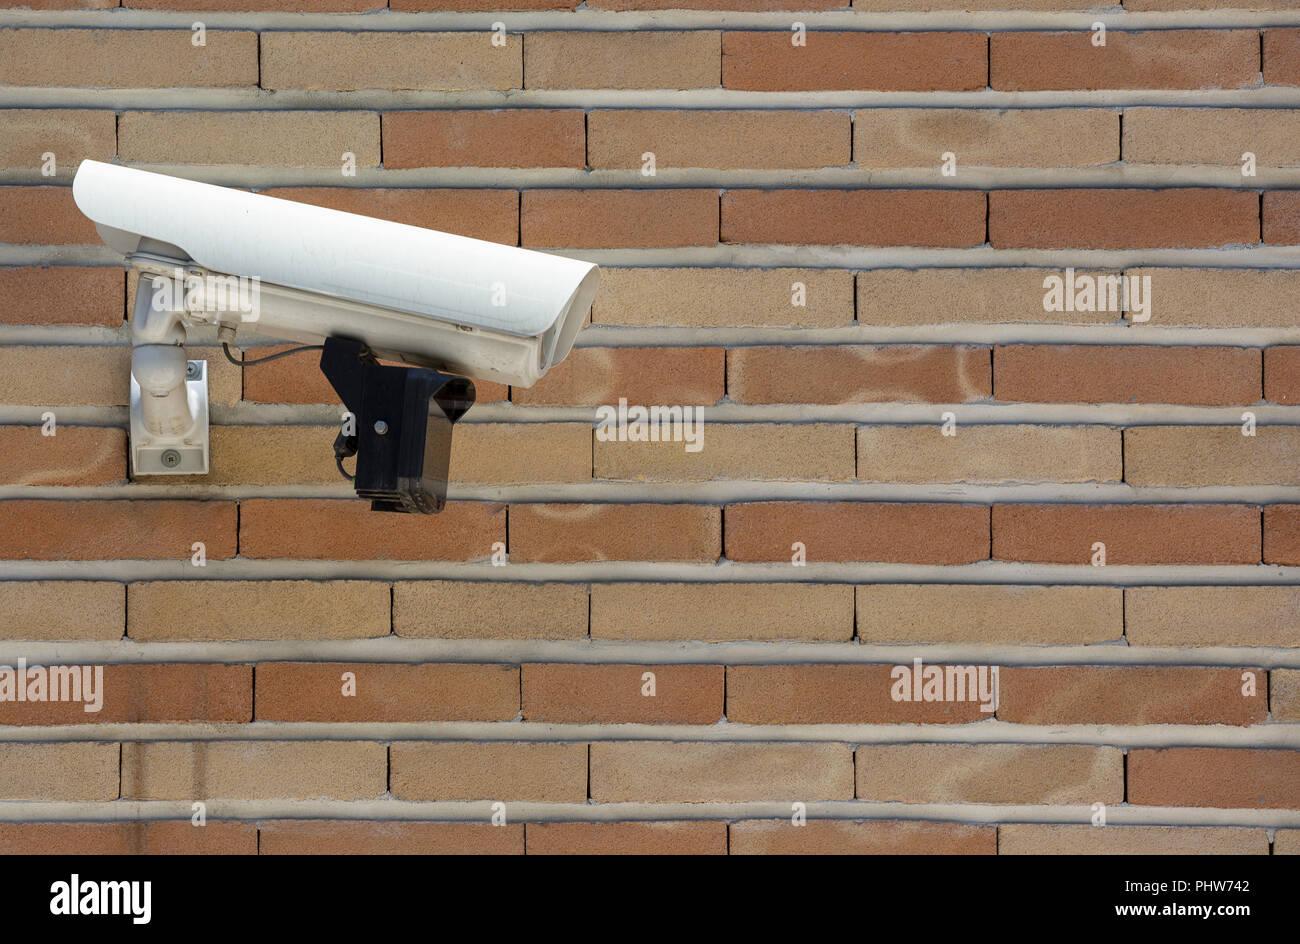 Surveillance camera brick wall - Stock Image